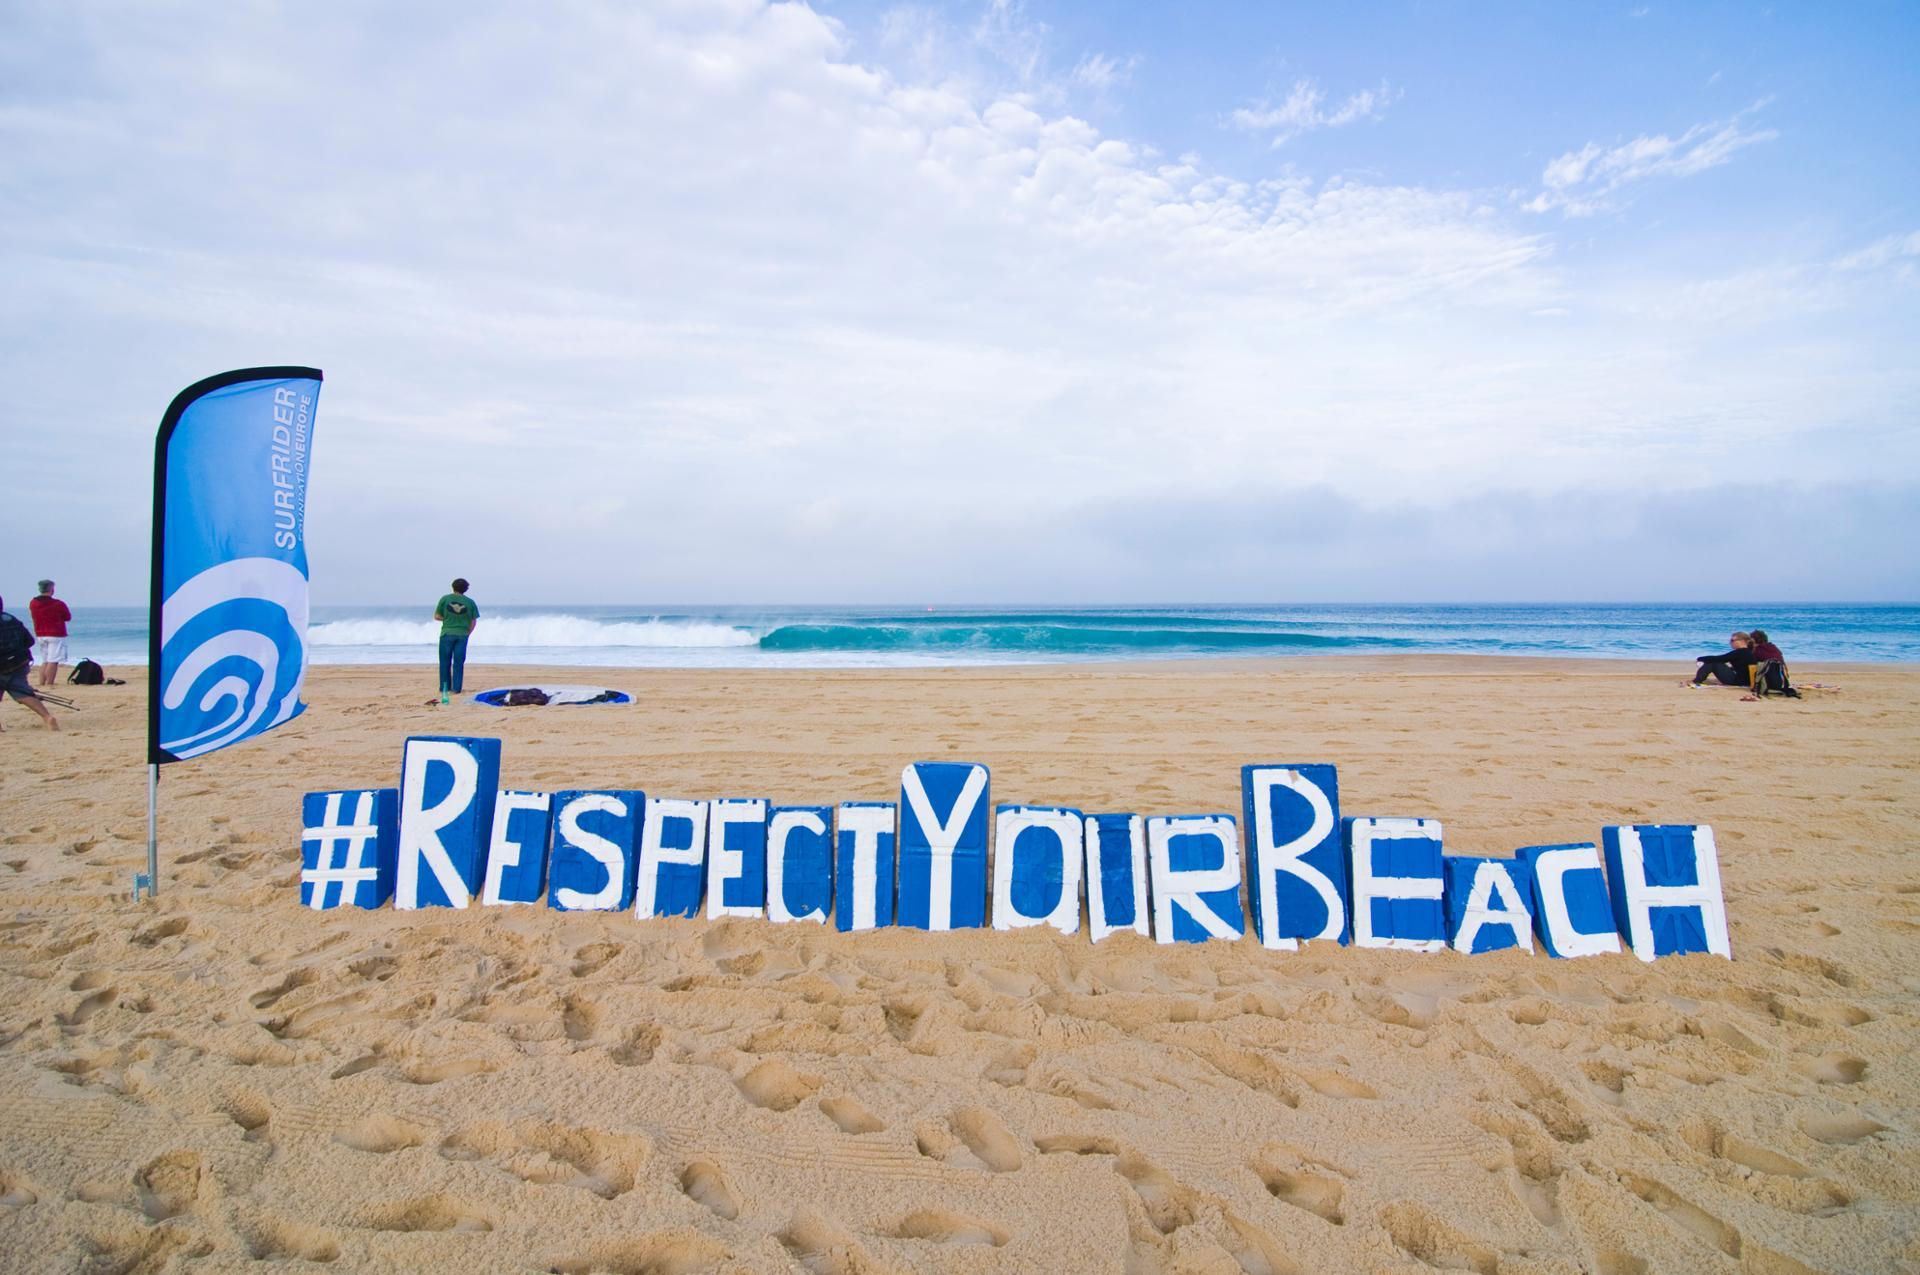 #RespectYourBeach